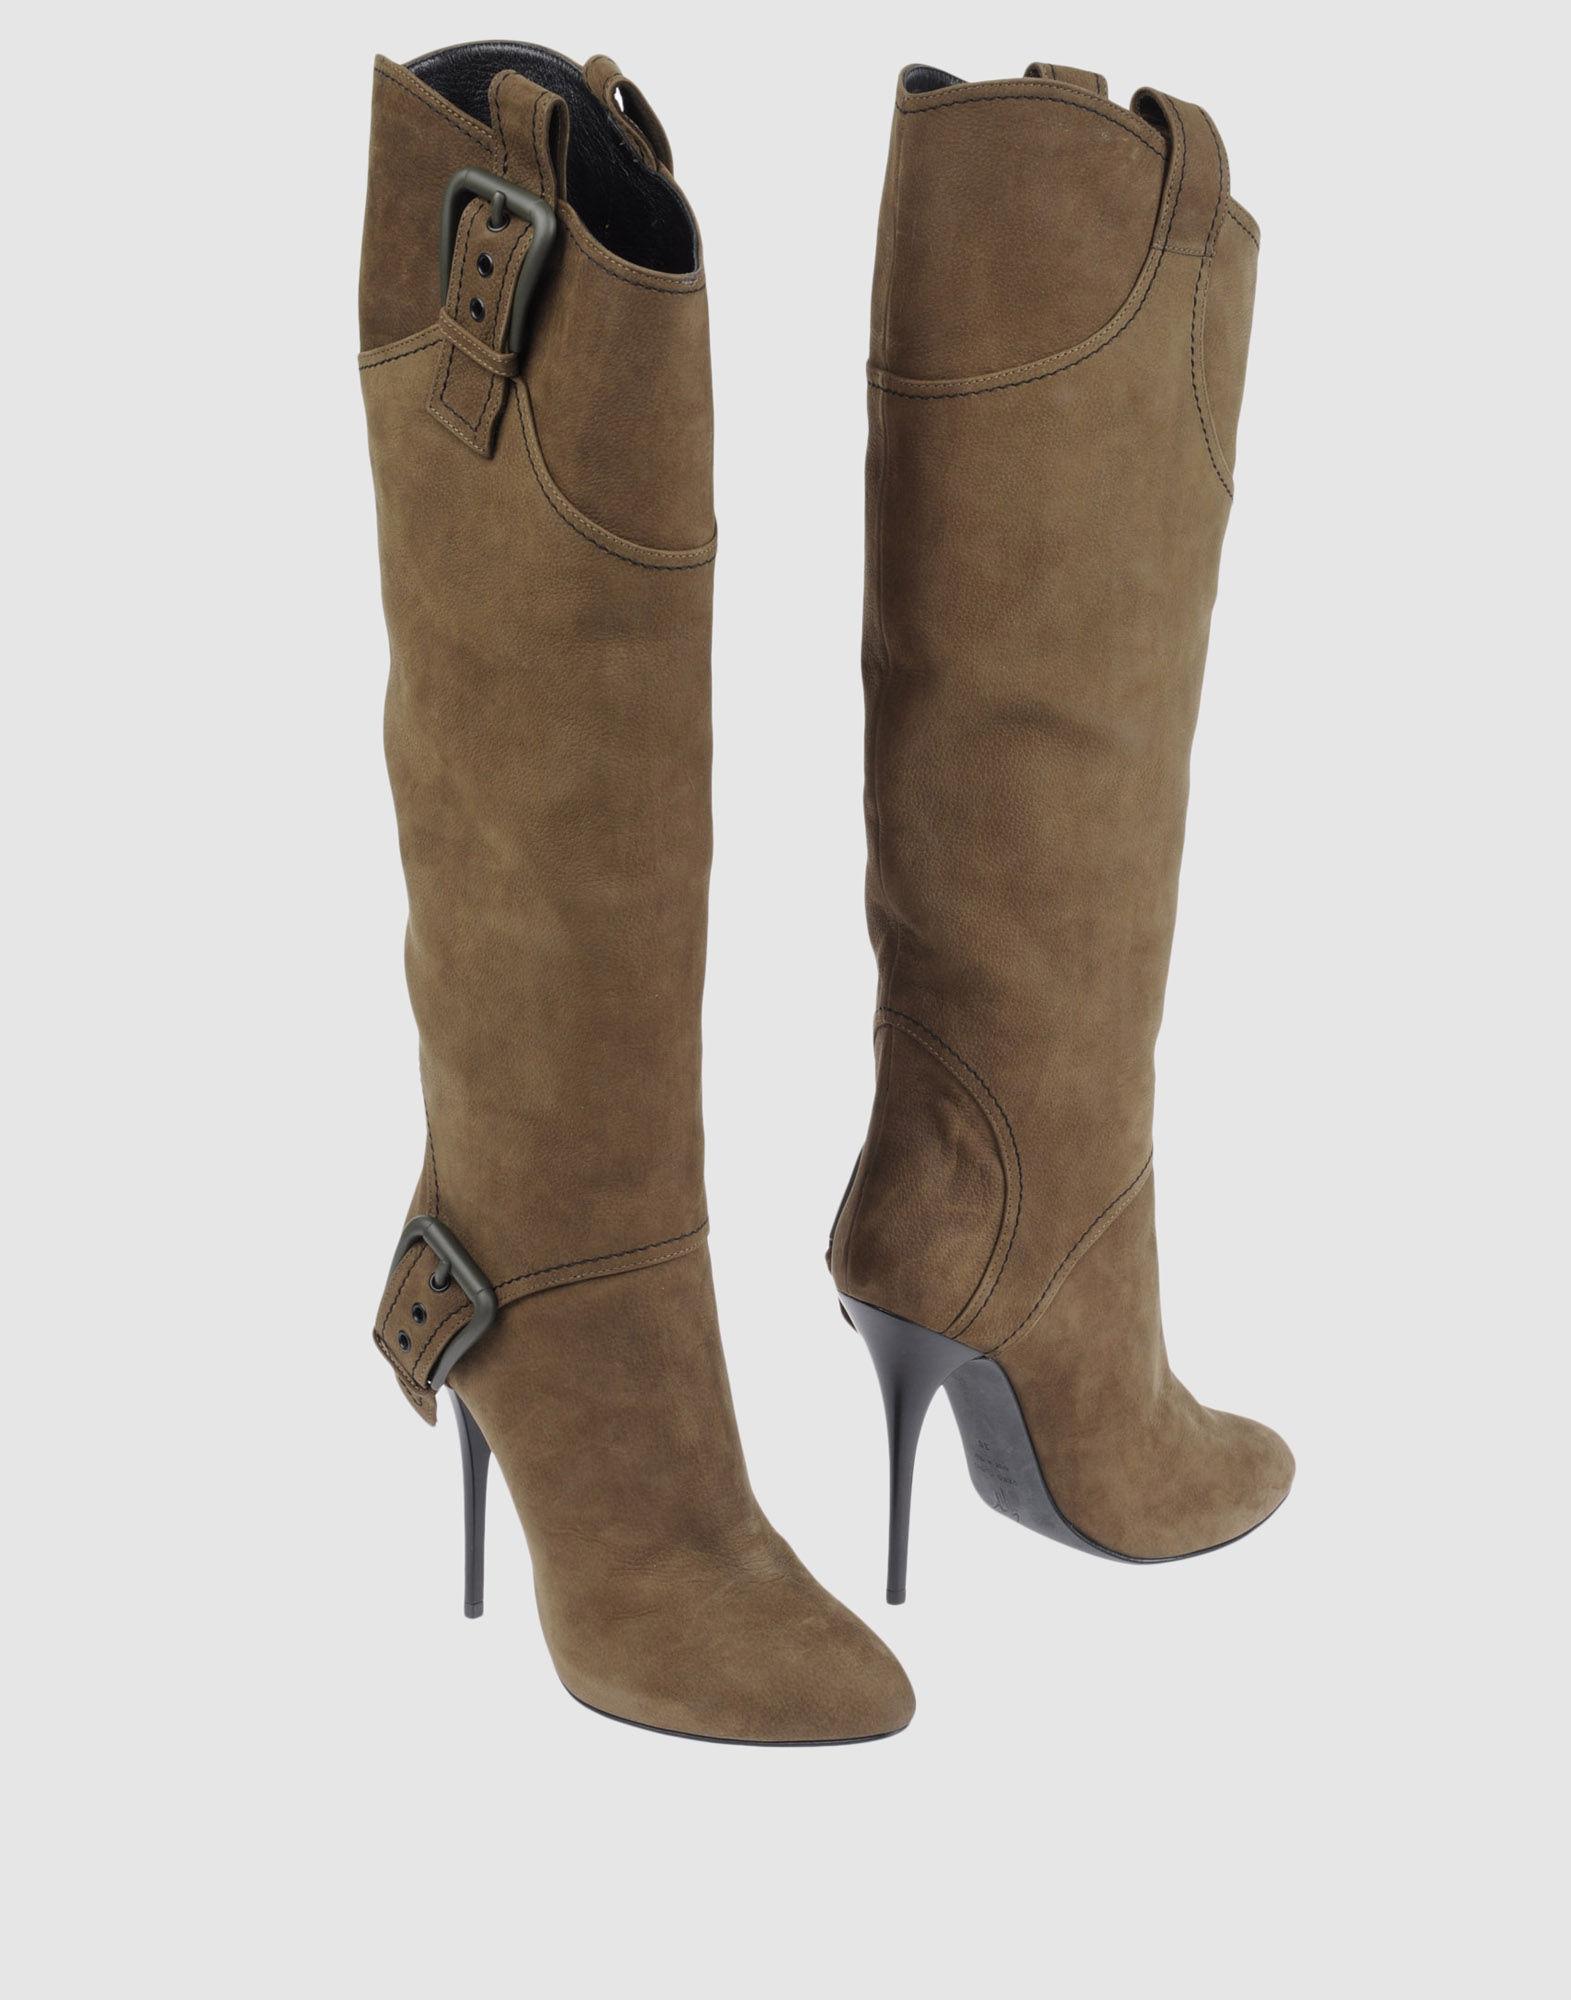 GIUSEPPE ZANOTTI Сапоги на каблуке сапоги кожаные на плоском каблуке 1137